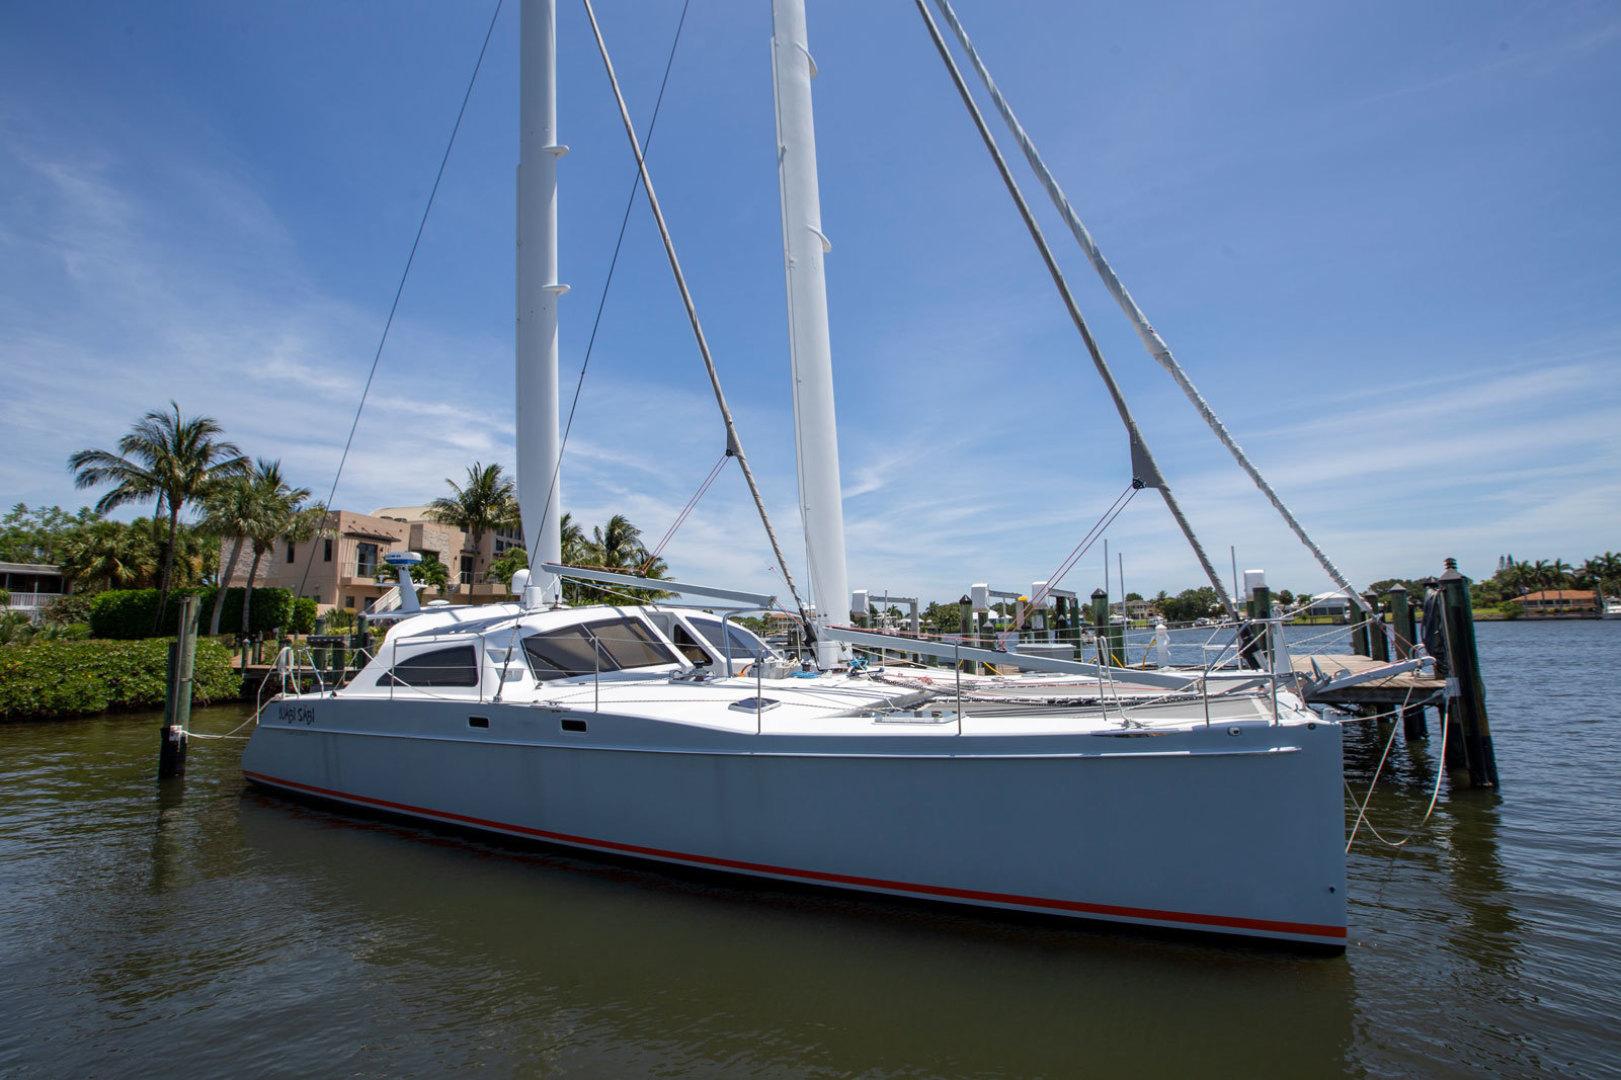 Atlantic-49 Catamaran 2018-Wabi Sabi Stuart-Florida-United States-1399306 | Thumbnail